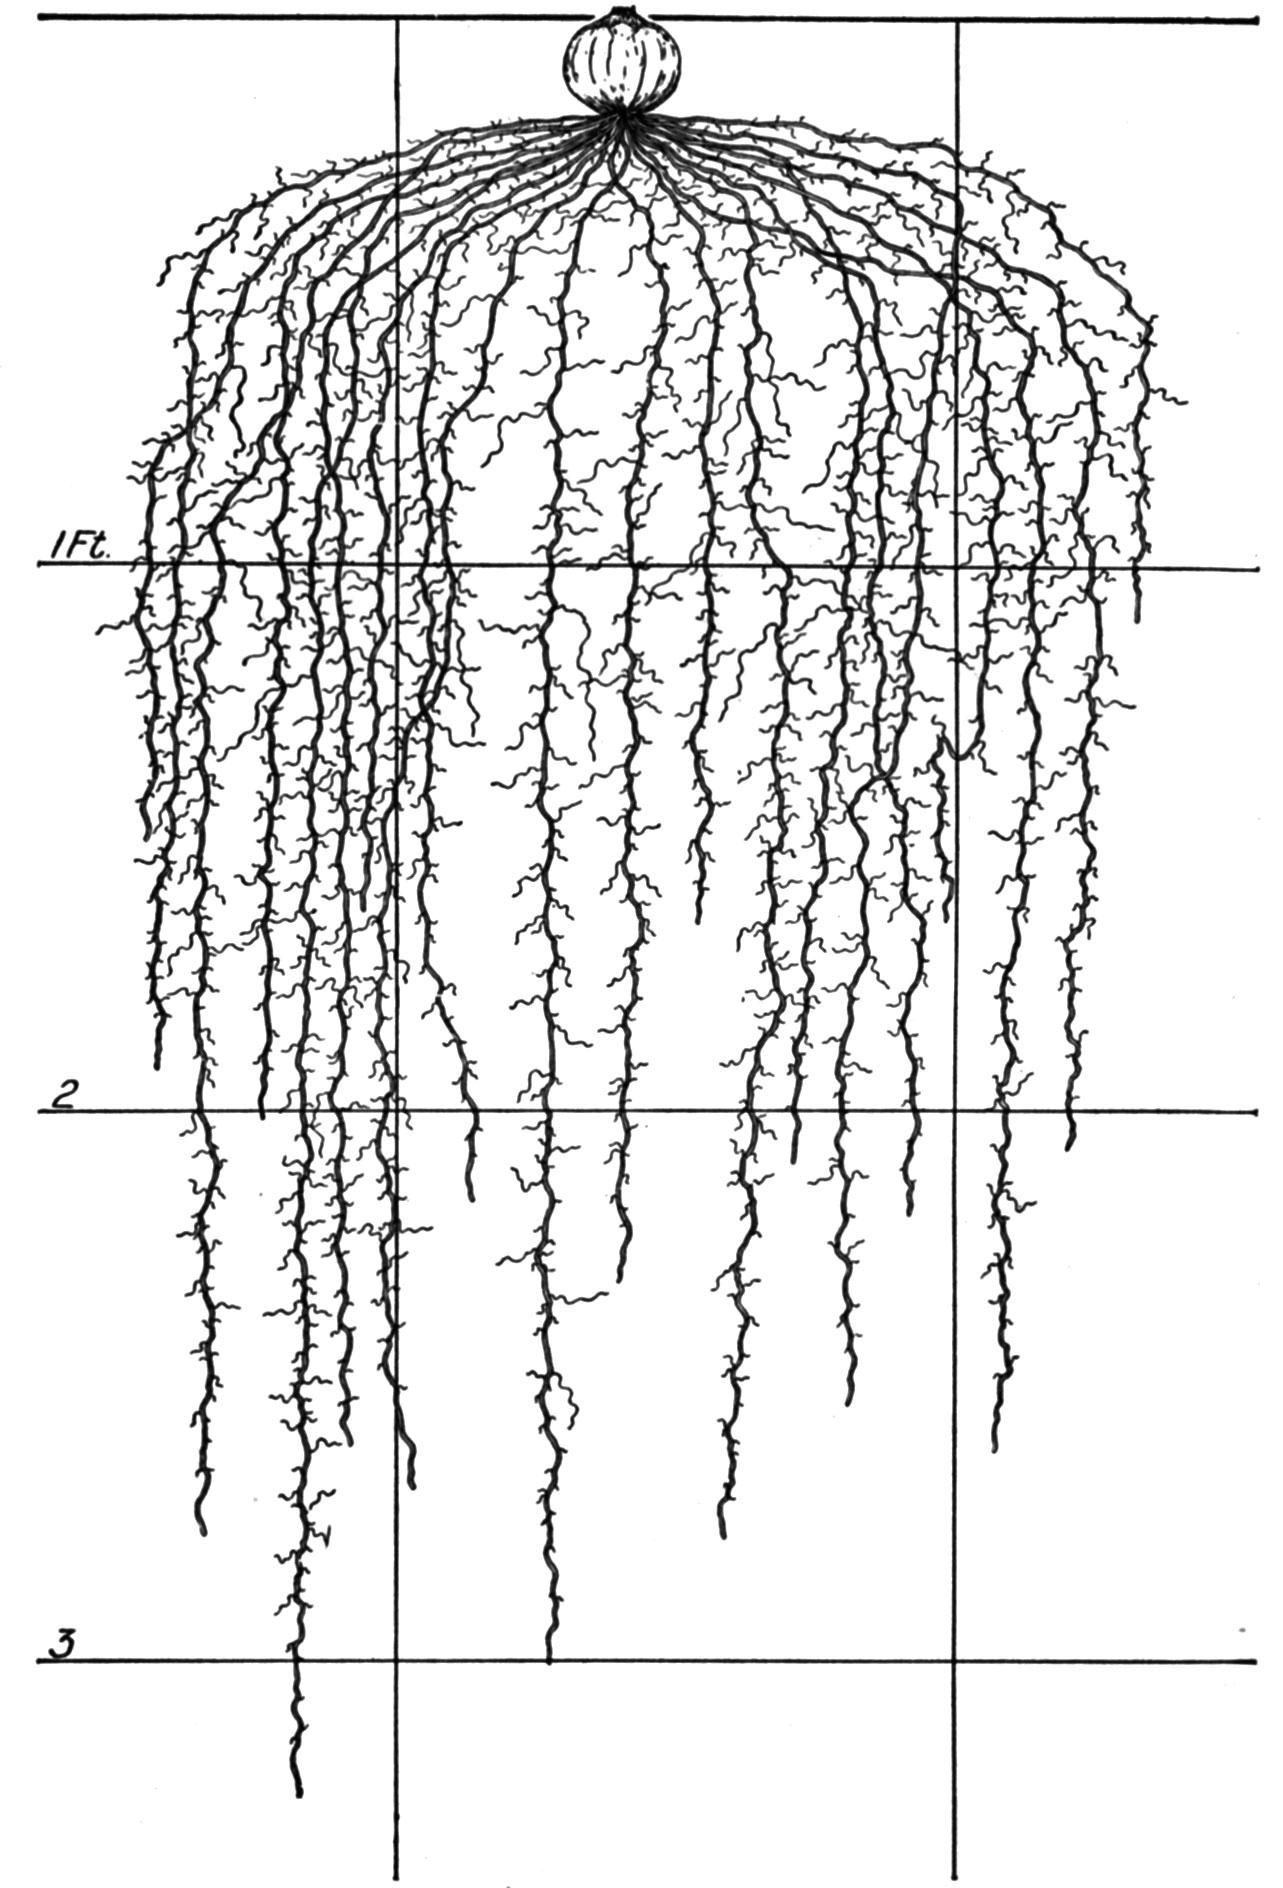 Drawn vegetables root vegetable  Vegetable Illustrations Crops: Root